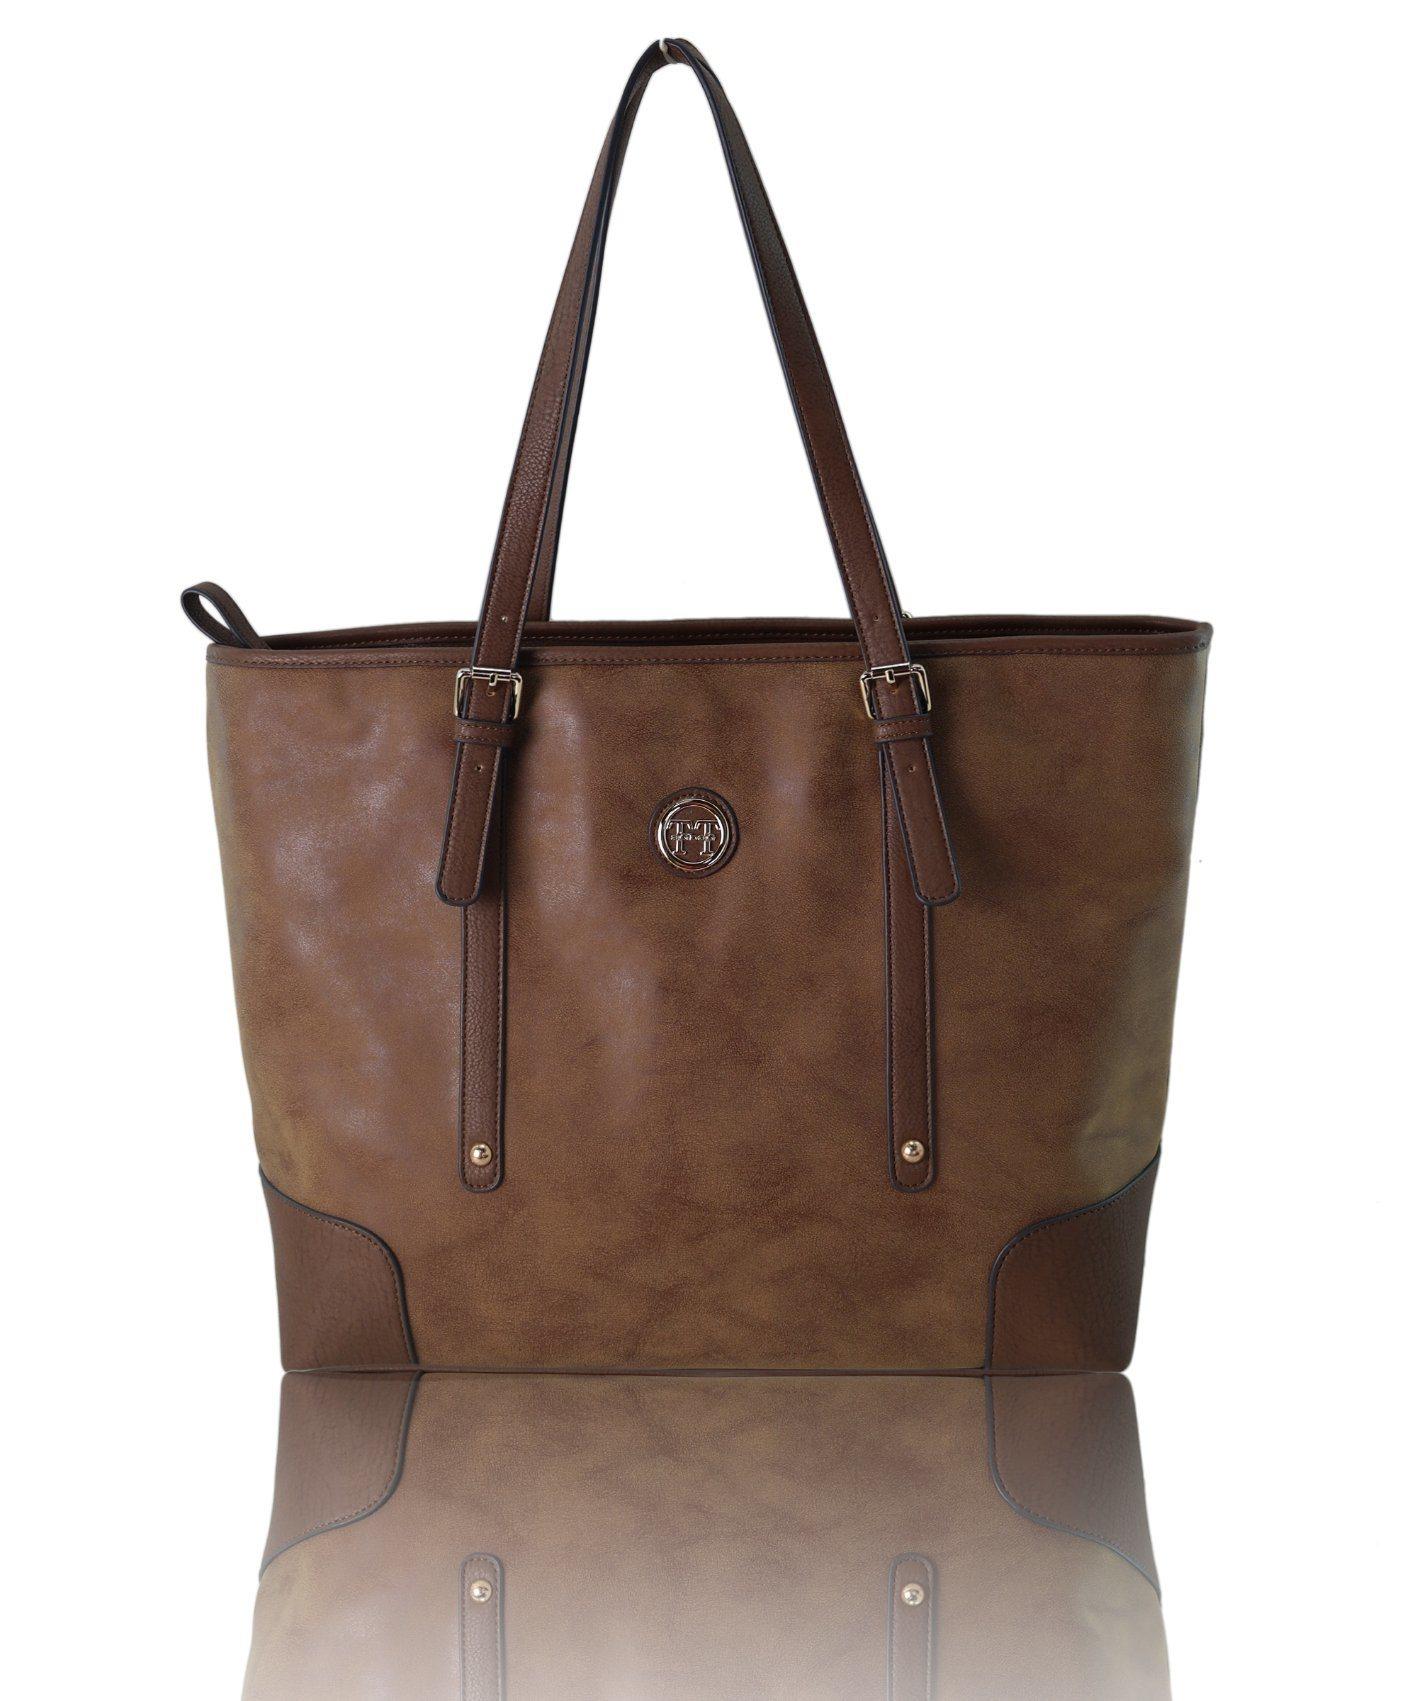 PU Lady Designer Fashion Bag Women Tote Handbag